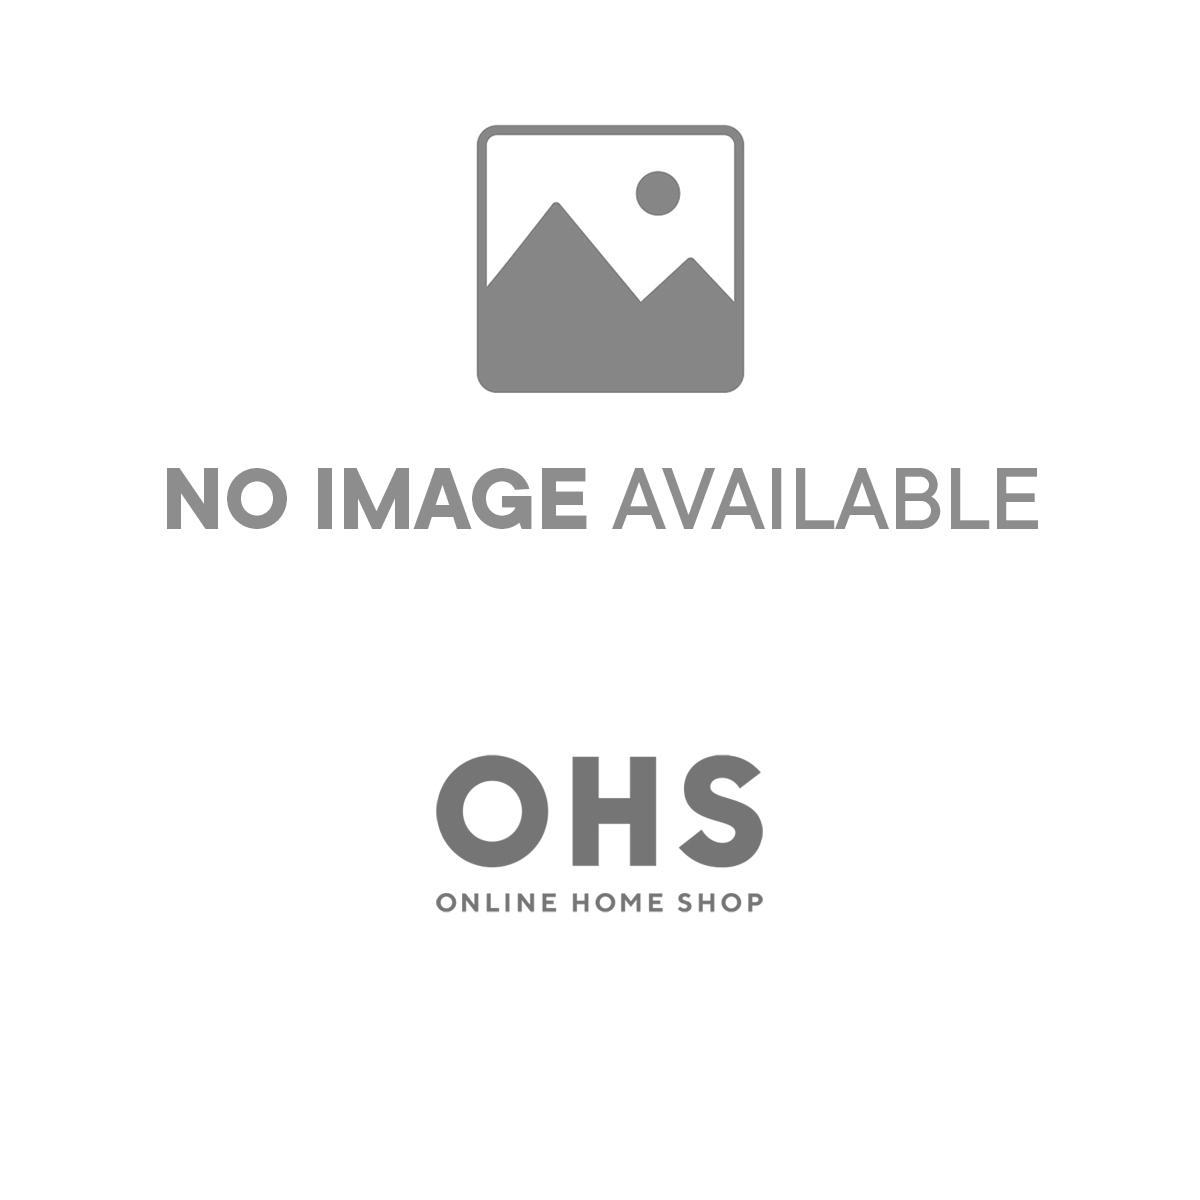 Sienna Crushed Velvet Band Duvet Set - Charcoal Grey